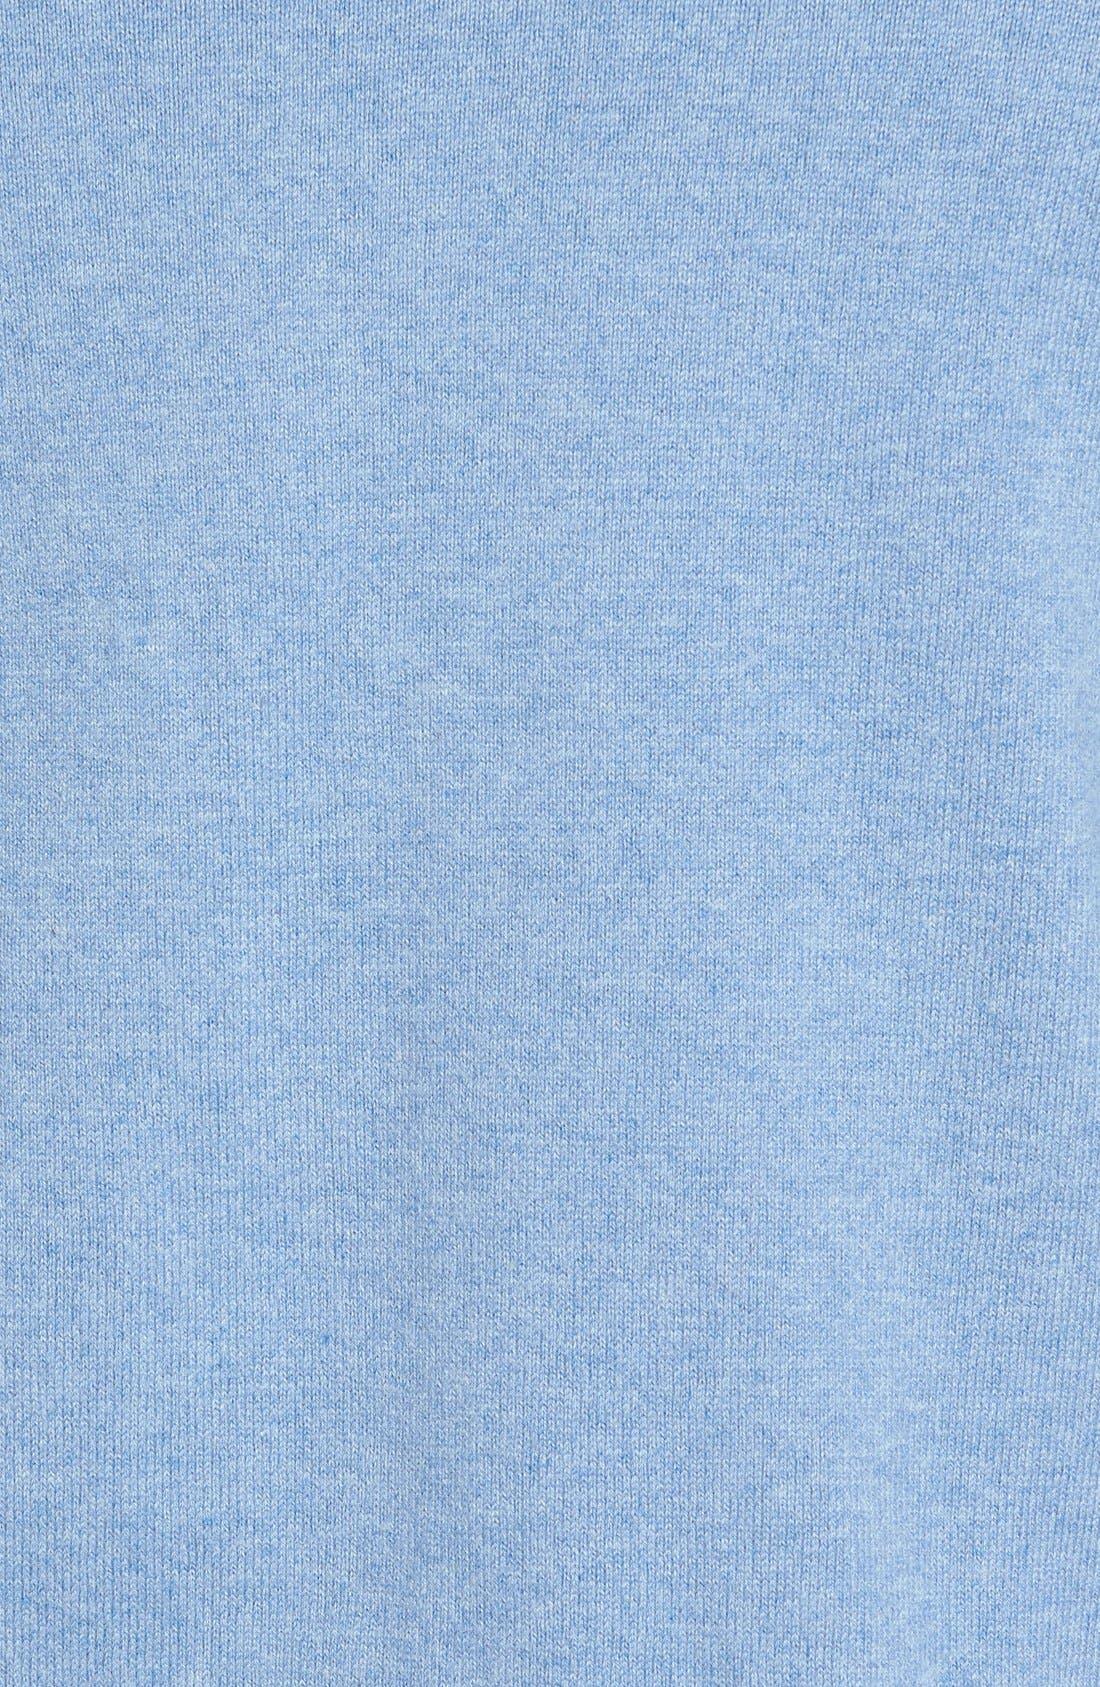 'Jersey Sport' Cotton Blend Crewneck Sweater,                             Alternate thumbnail 36, color,